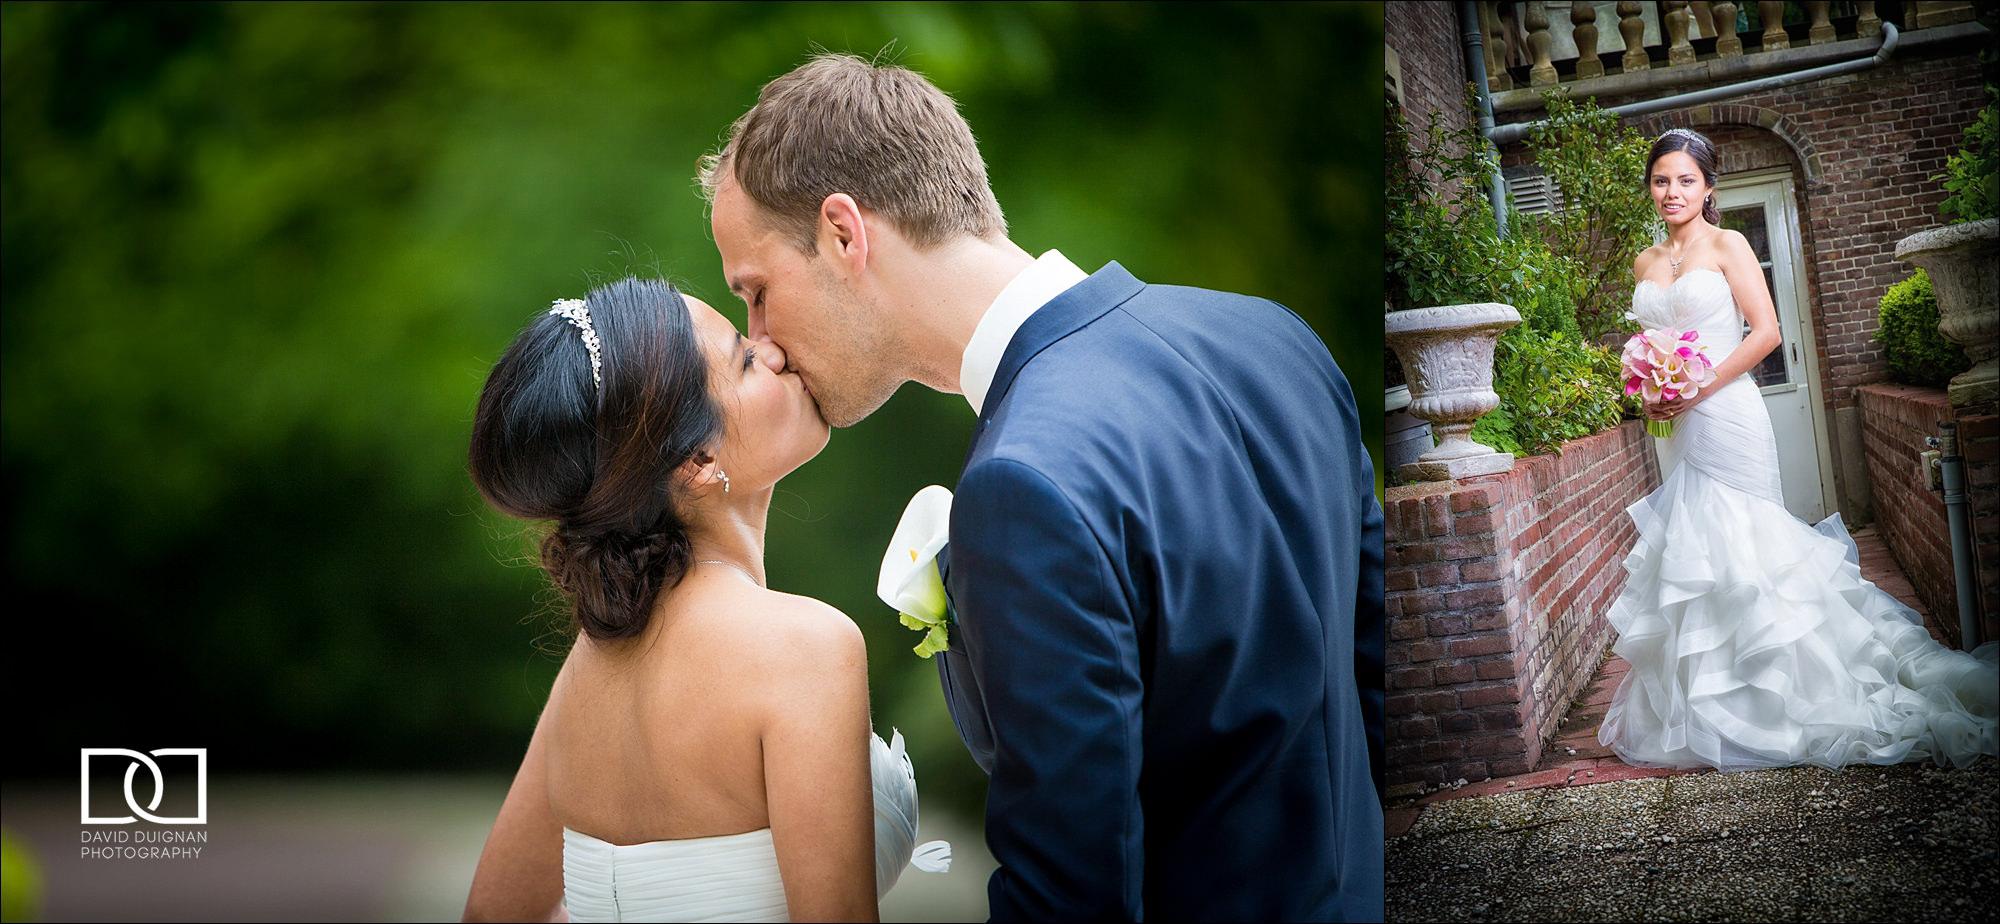 dublin wedding photographer david duignan photography wedding photos 0035